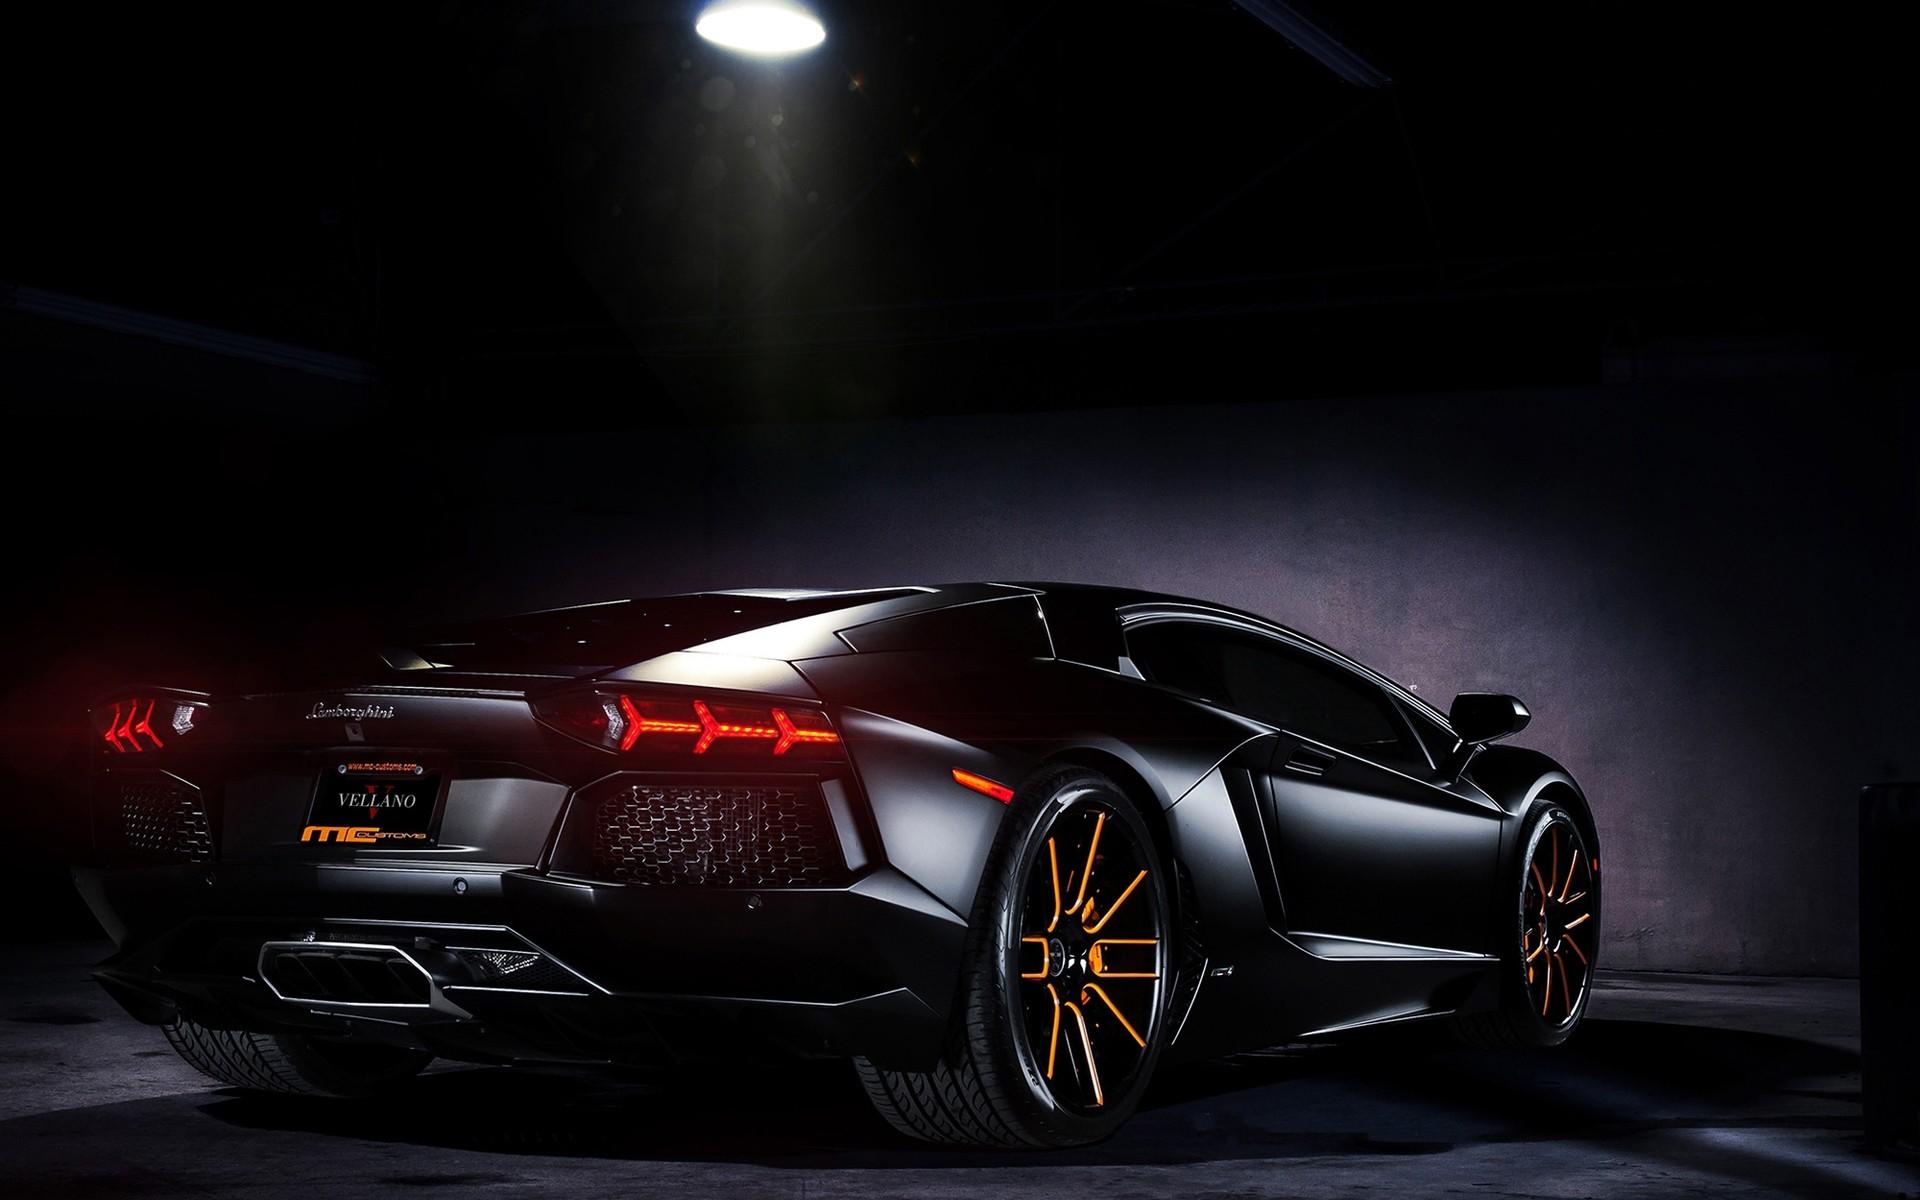 Lamborghini Wallpaper HD  WallpaperSafari